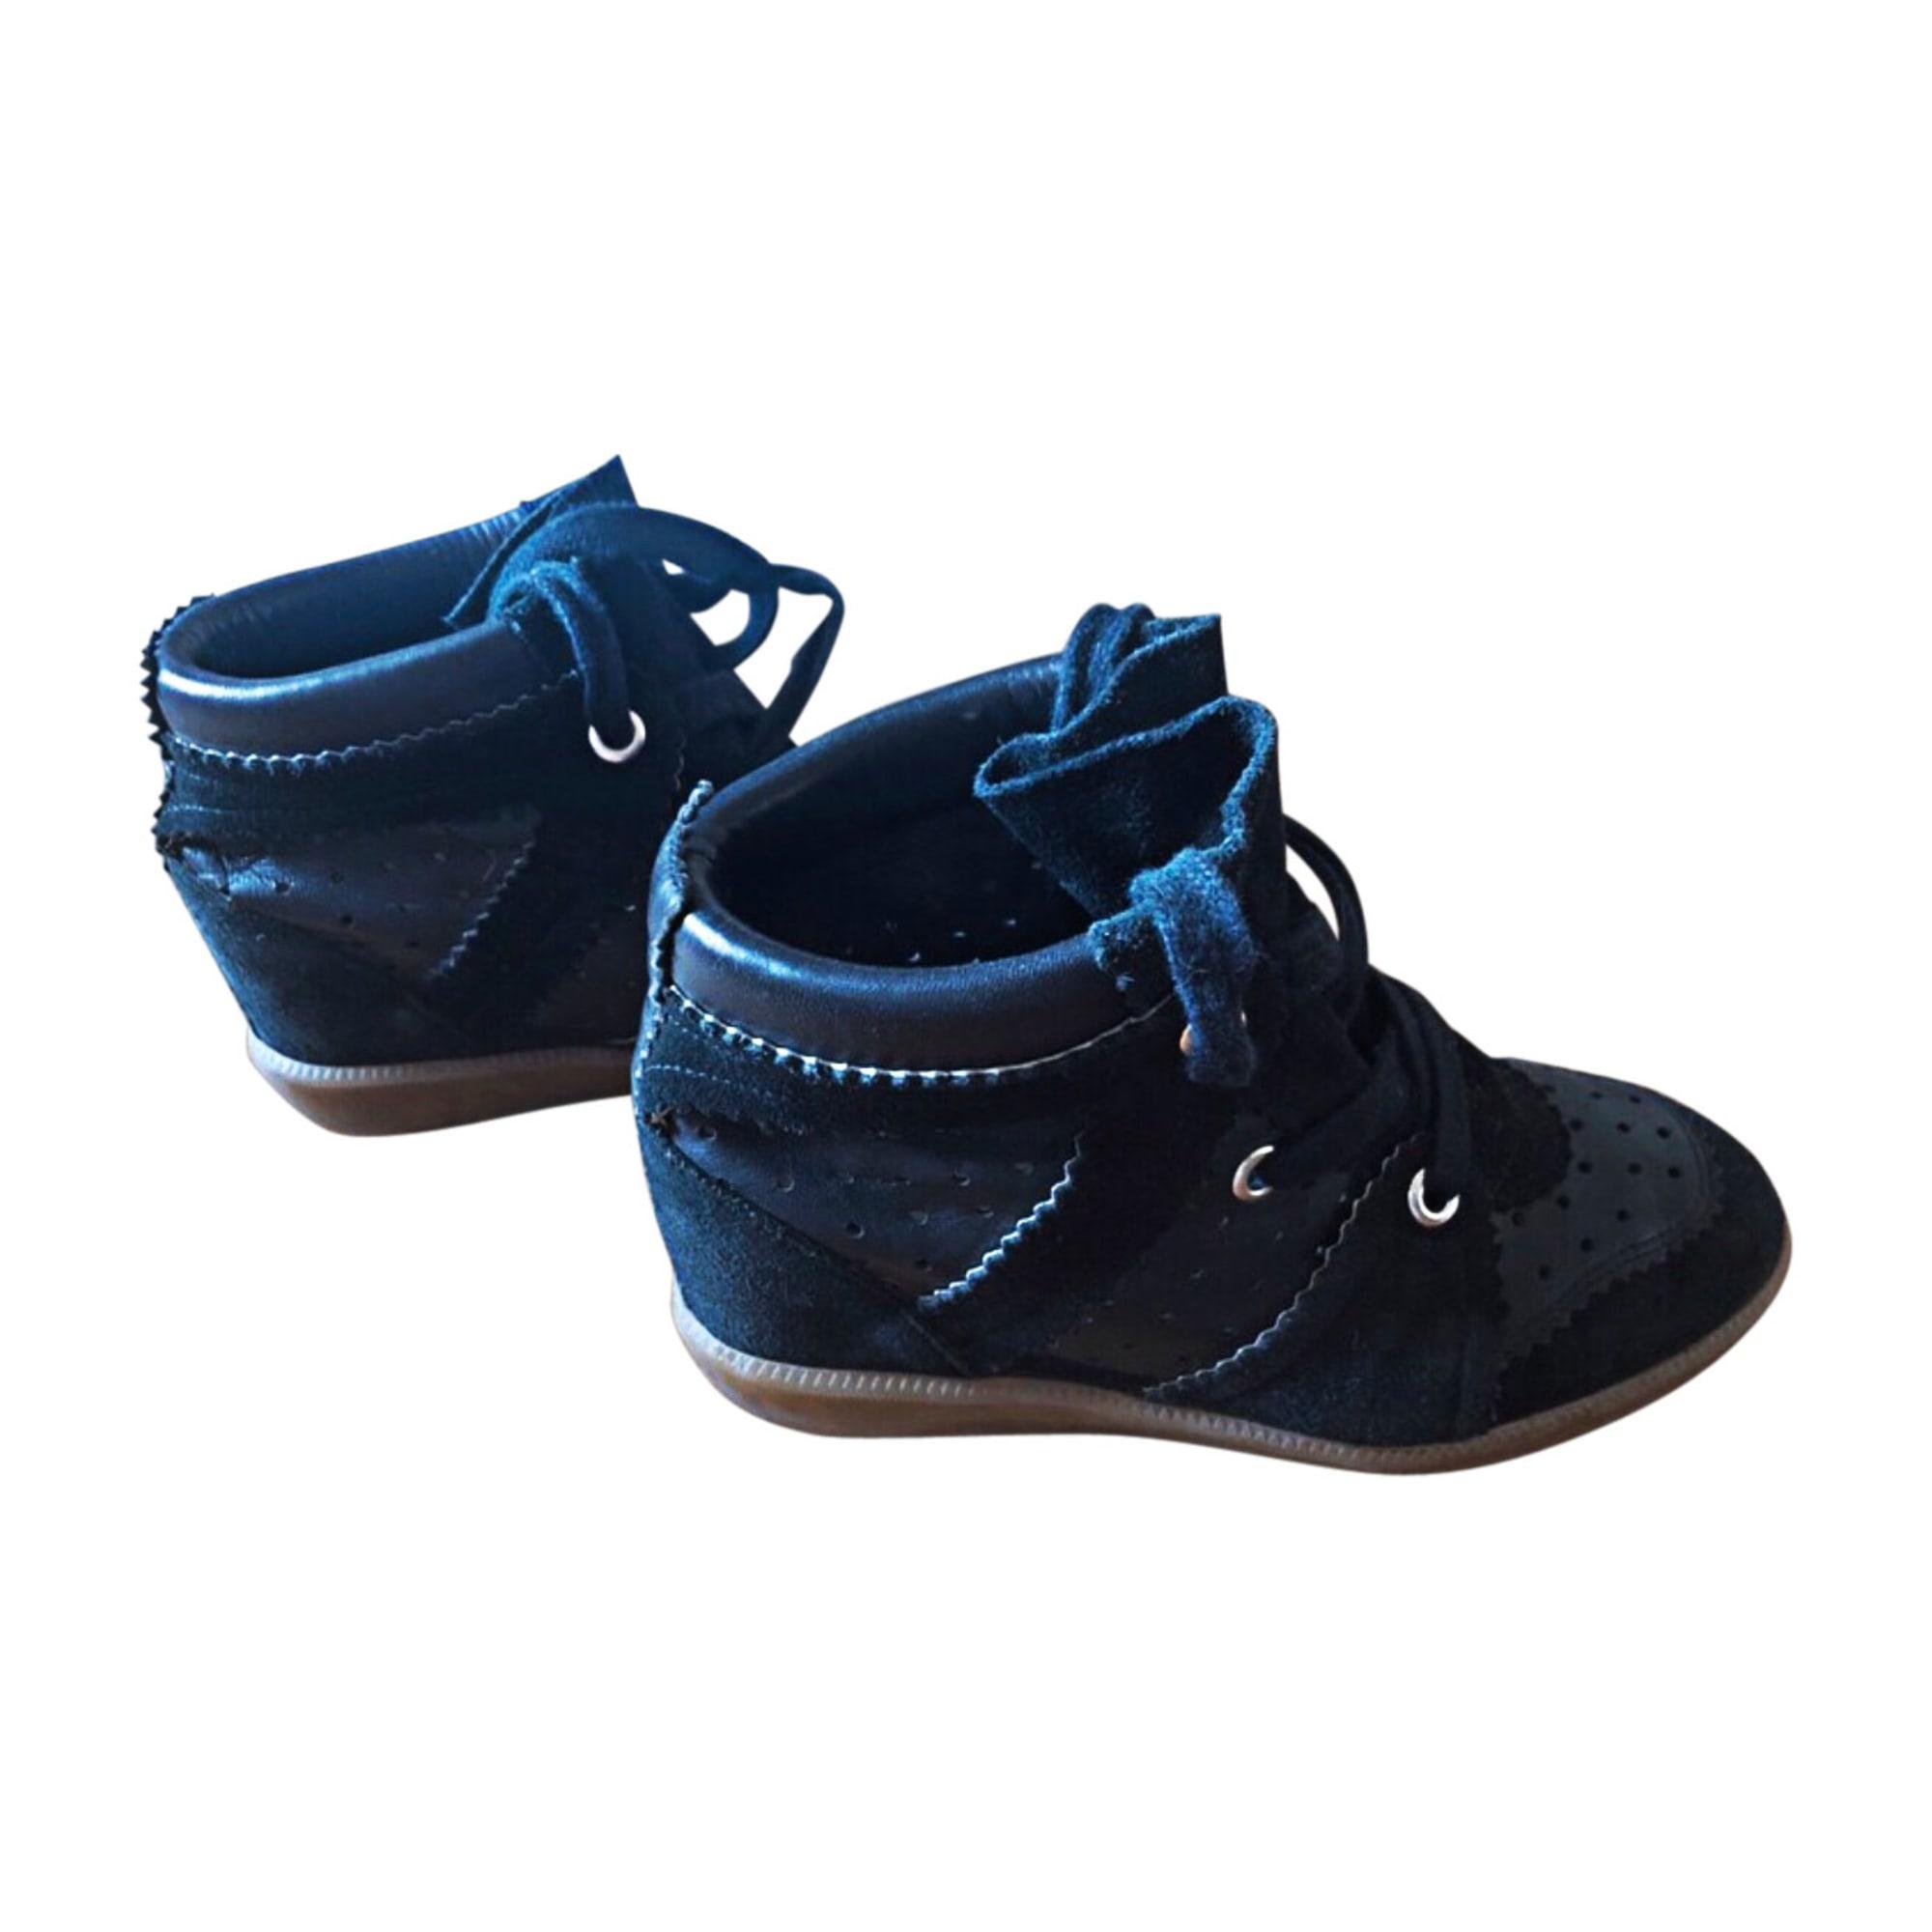 Sneakers ISABEL MARANT Black